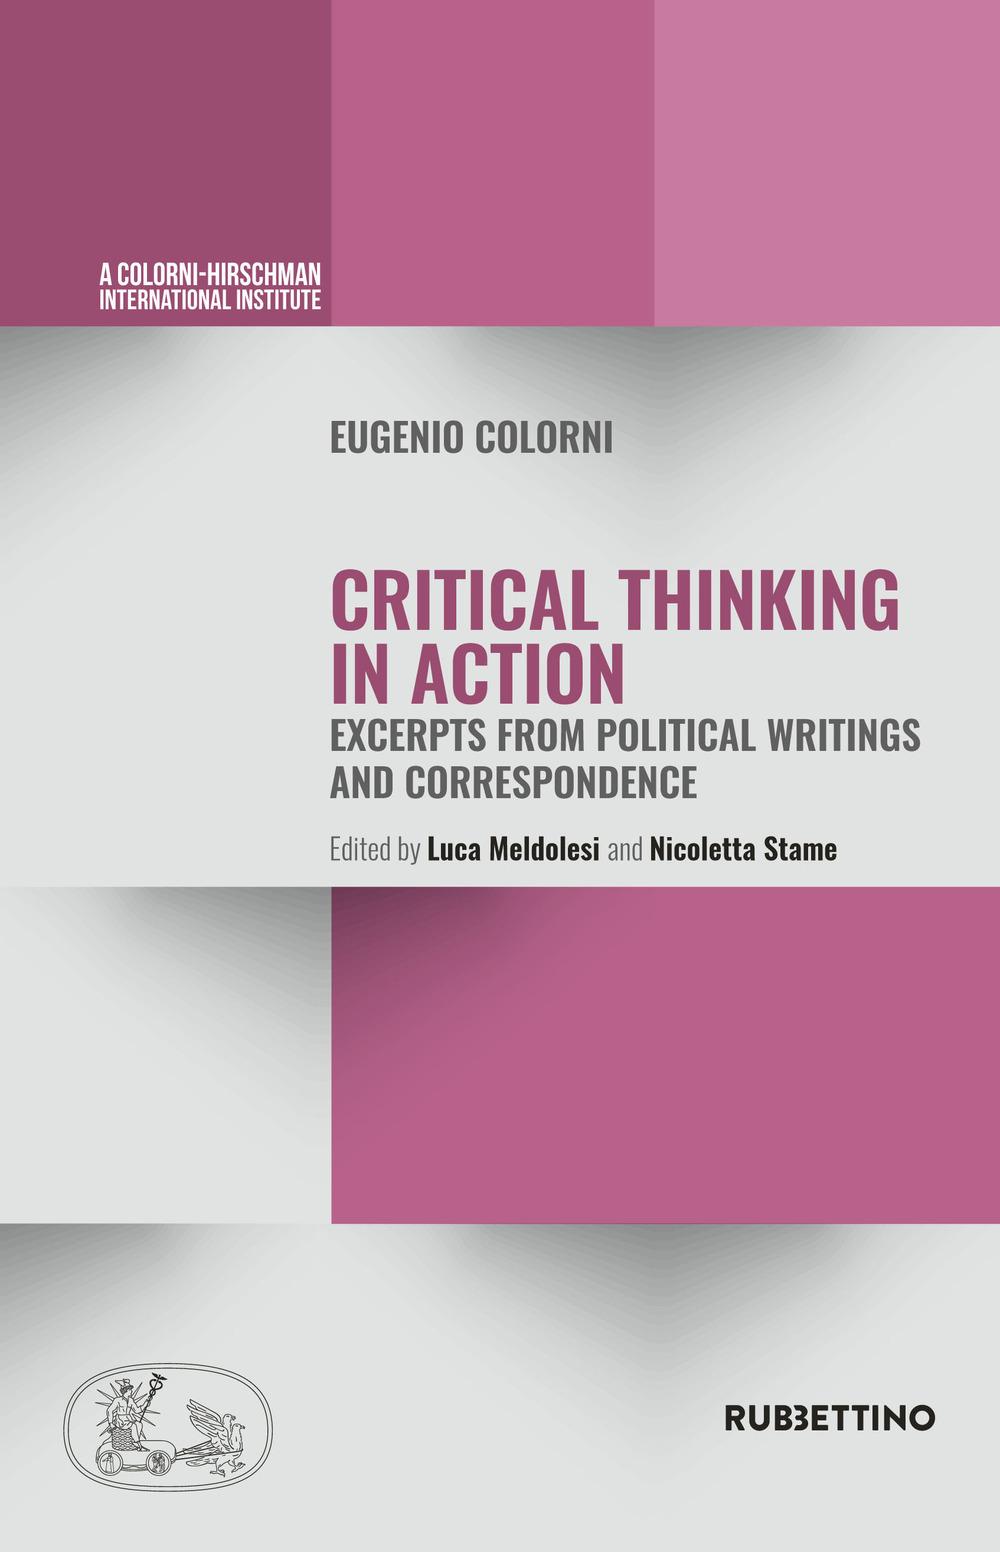 Eugenio Colorni, Critical Thinking in Action